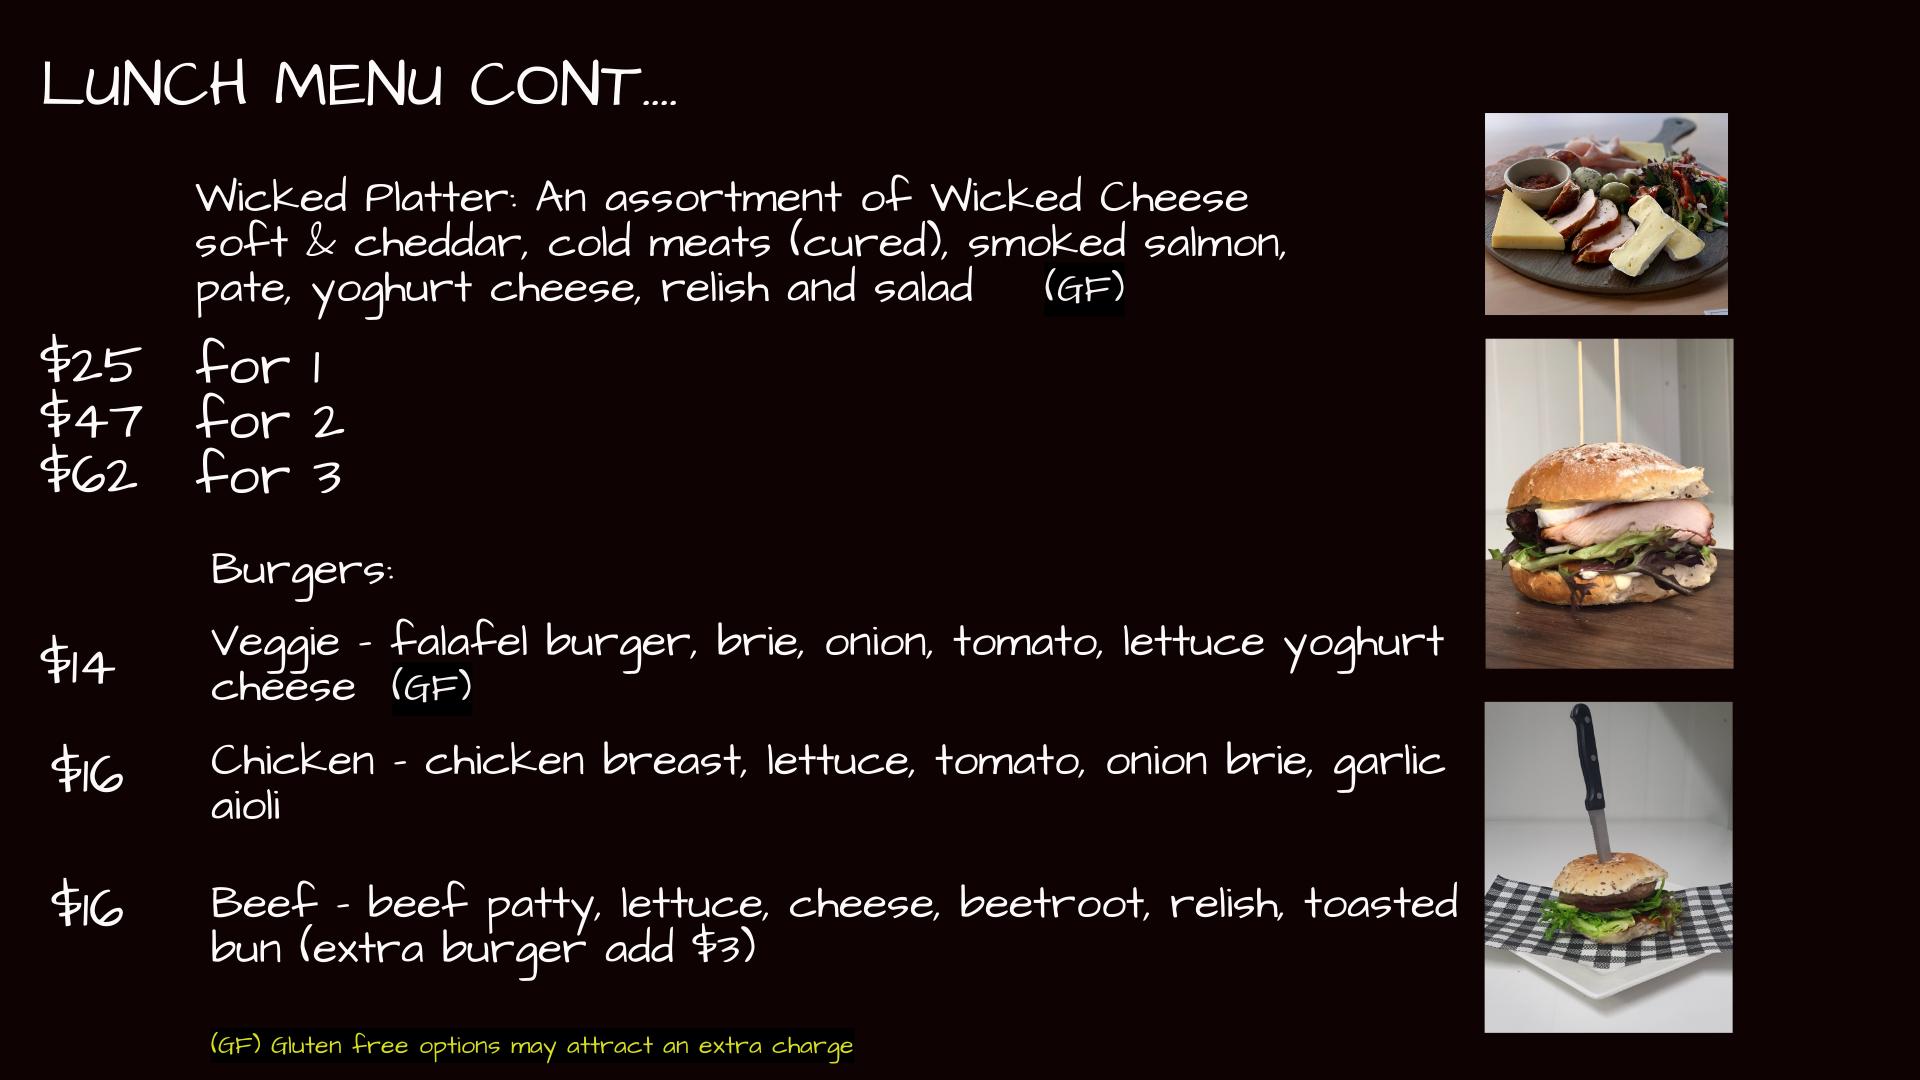 1619736933891-fusiontemplate-screenshot-lunch-menu-part-2.png